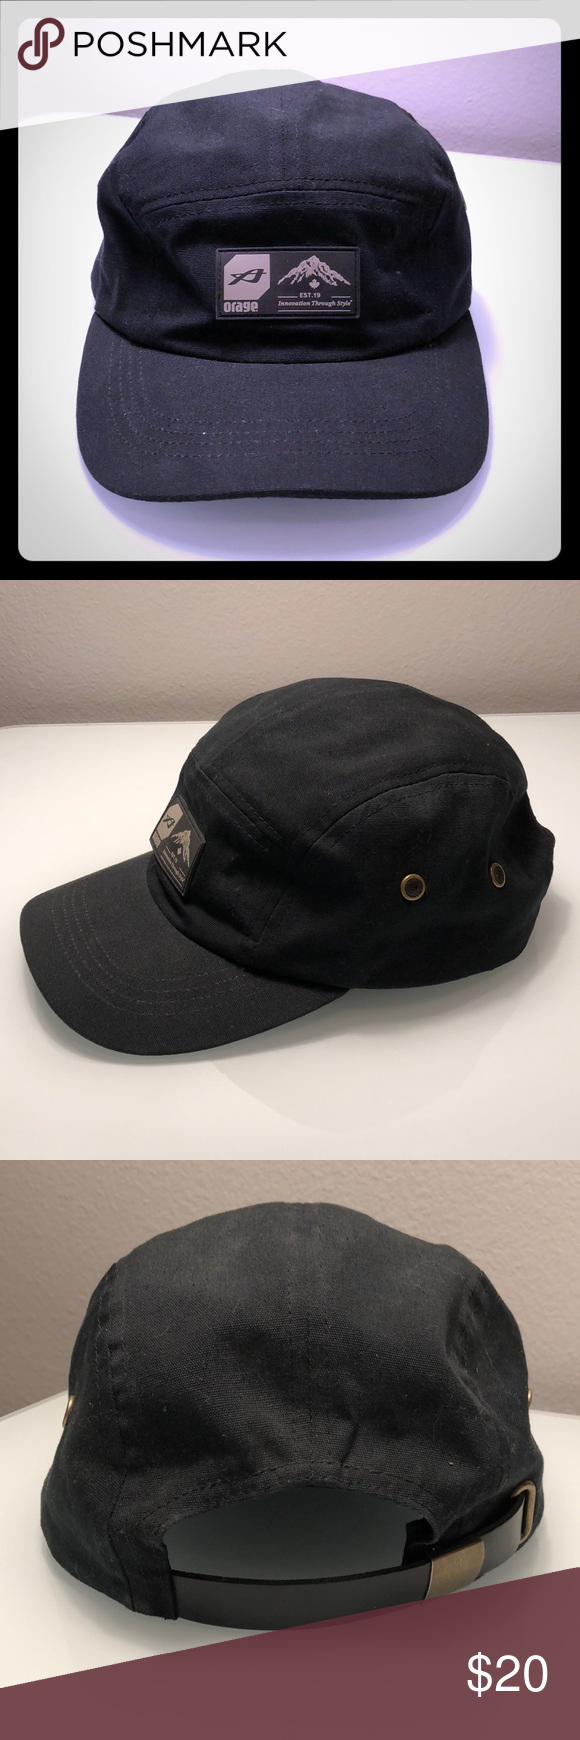 Orage Five Panel Hat Black Orage Ski Supplies 5 Panel Hat Two Metal Vent Holes On Each Side W An Adjustable Faux L Panel Hat Five Panel Hat Accessories Hats